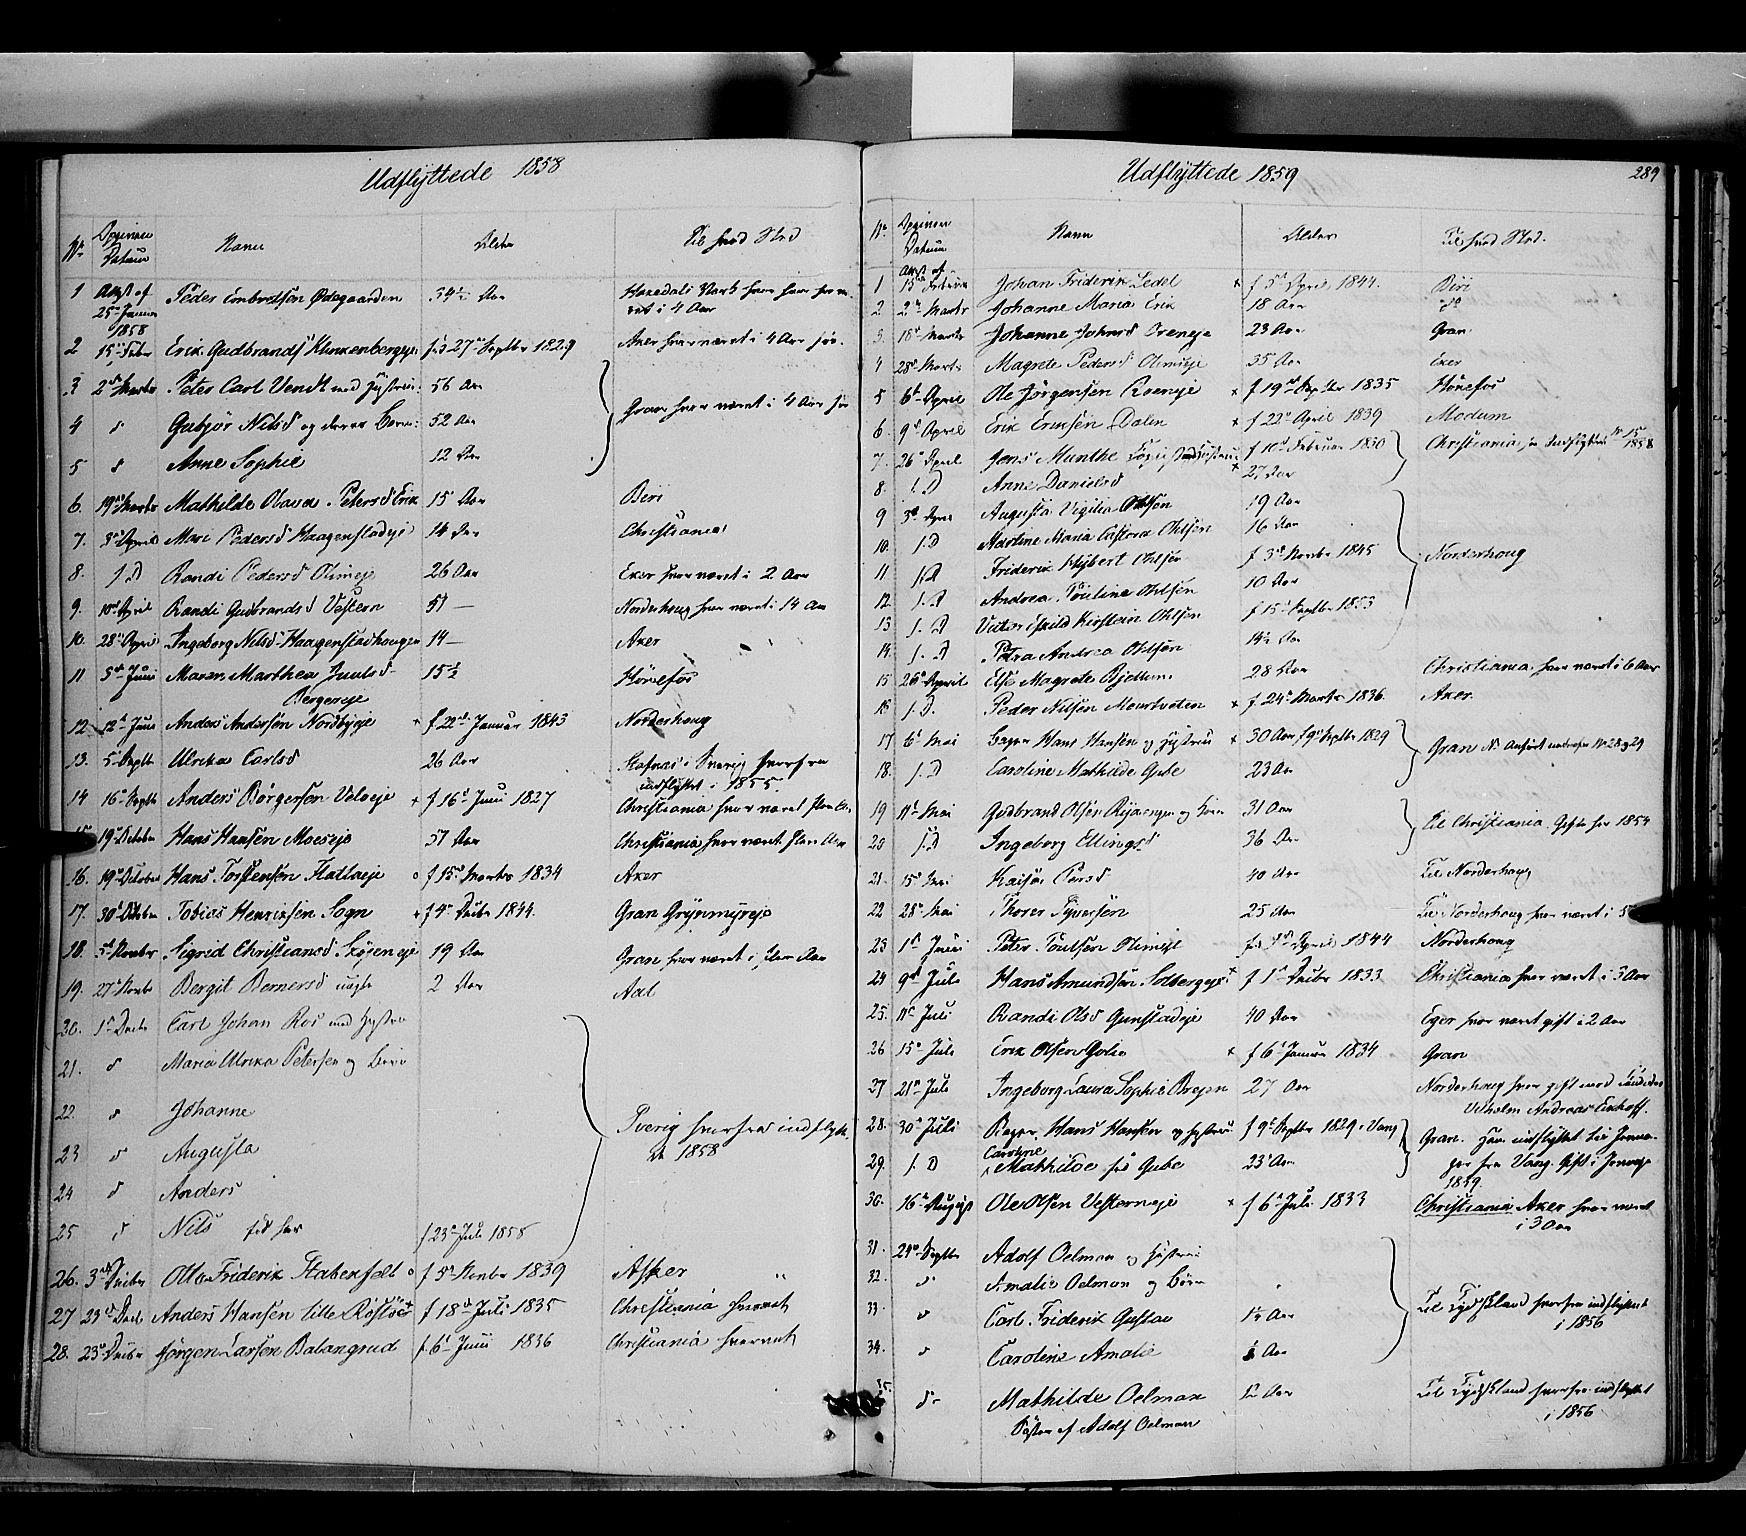 SAH, Jevnaker prestekontor, Ministerialbok nr. 7, 1858-1876, s. 289